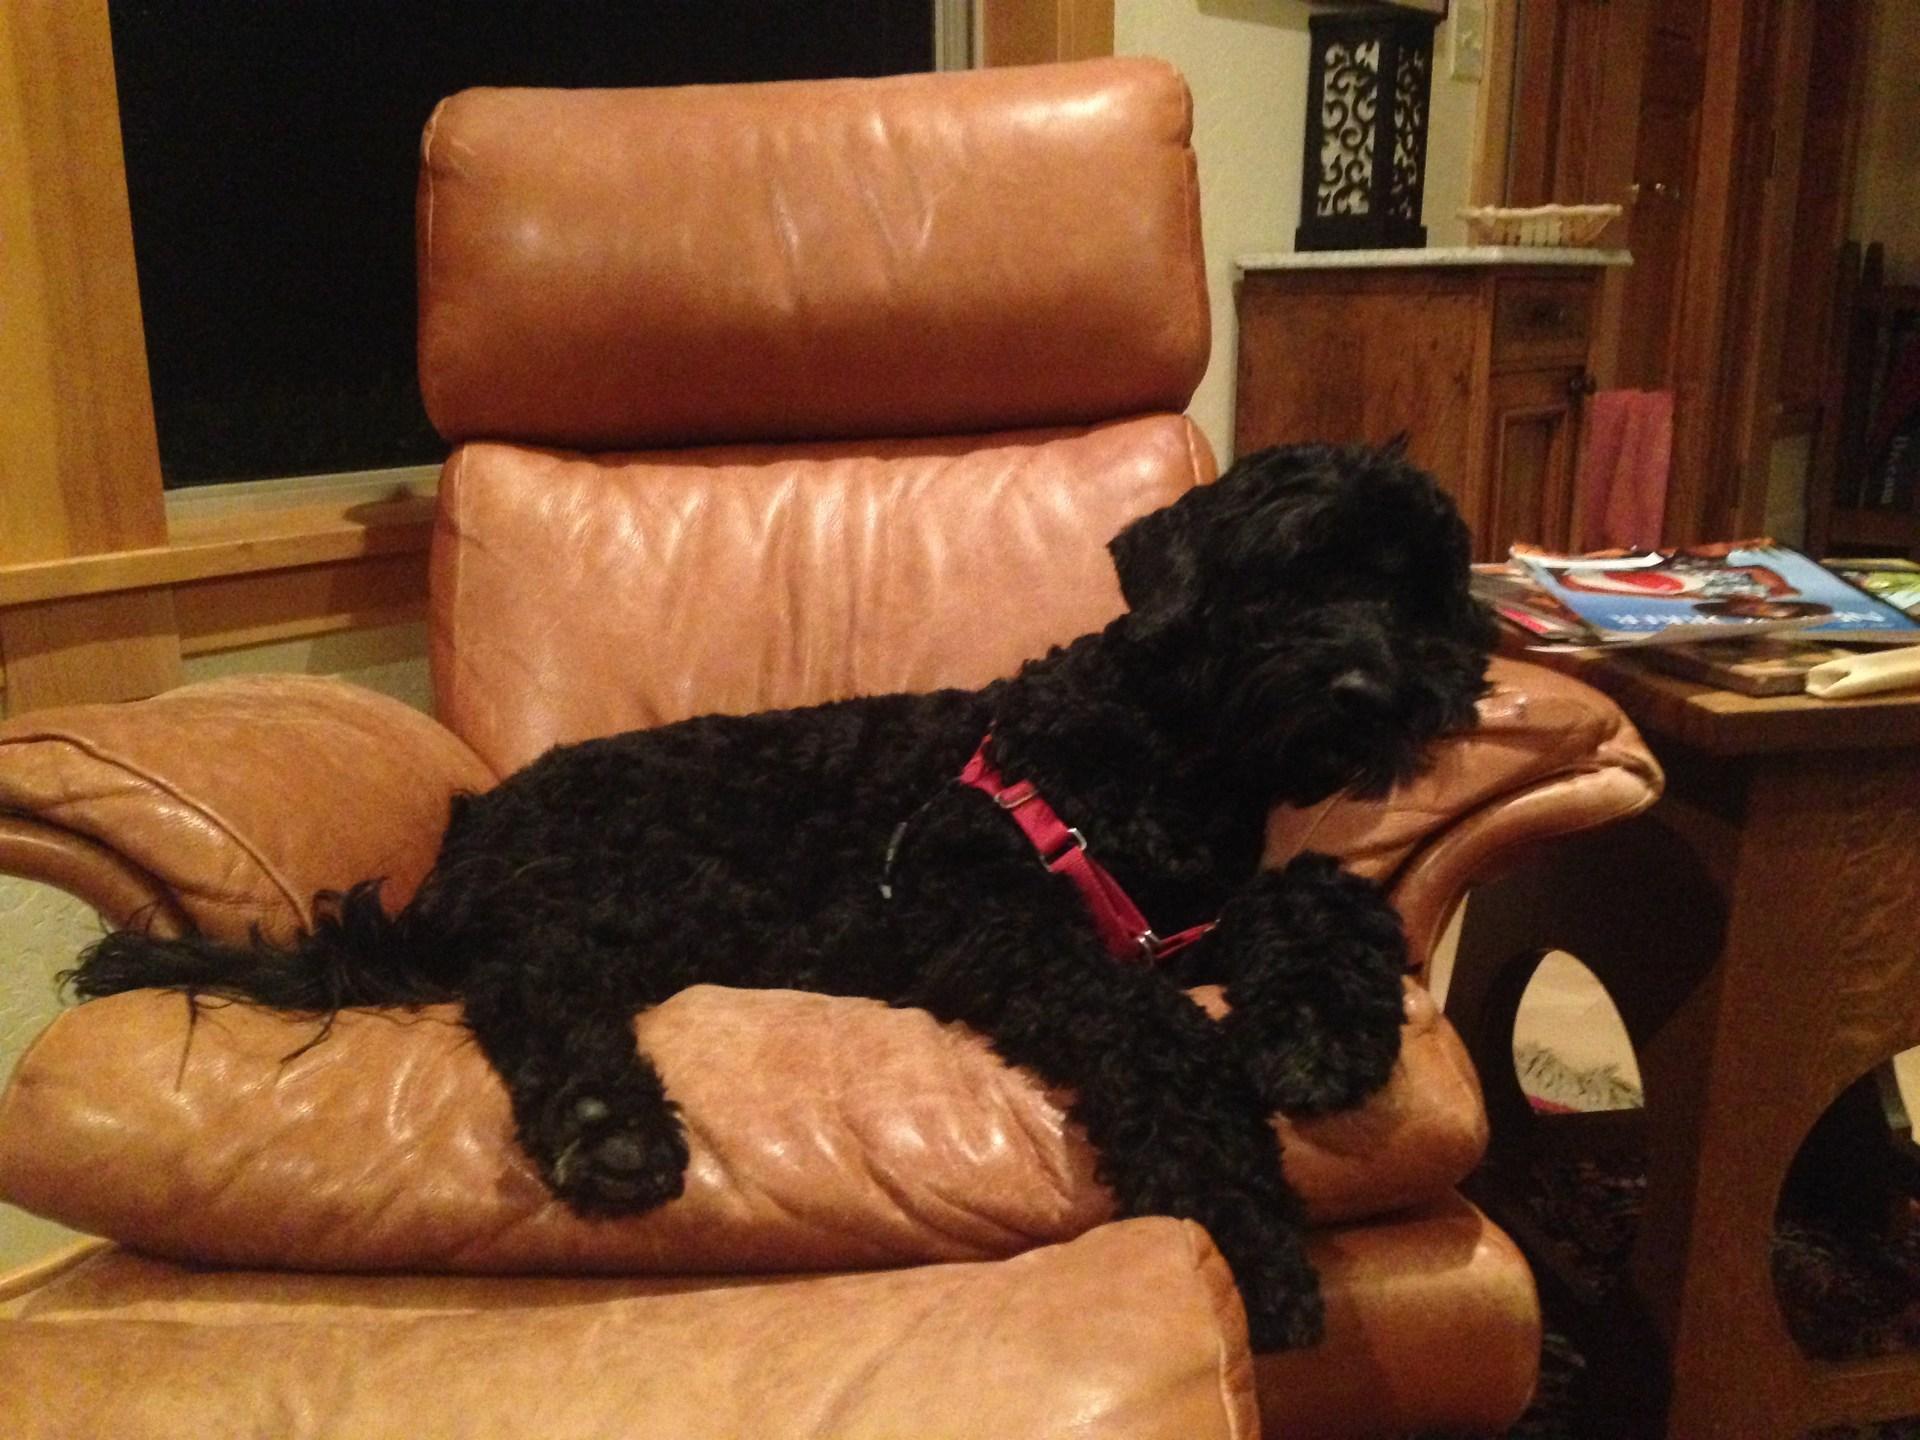 Image of sleeping dog